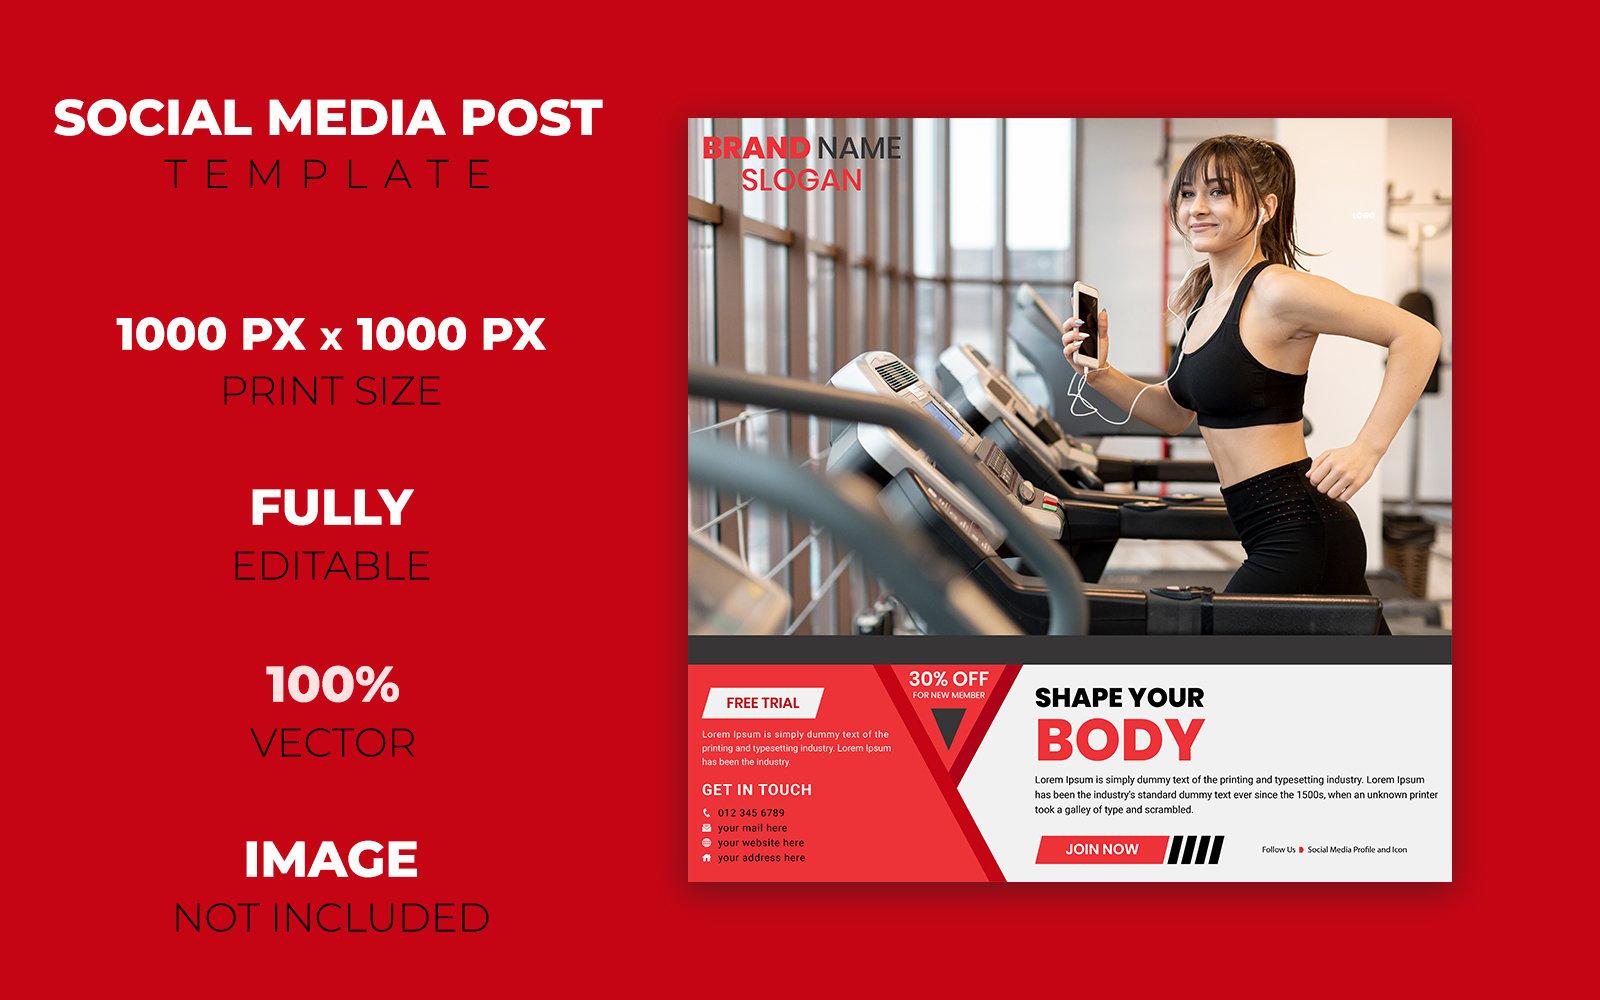 Gym Social Media Post Design Corporate Identity Template 102695